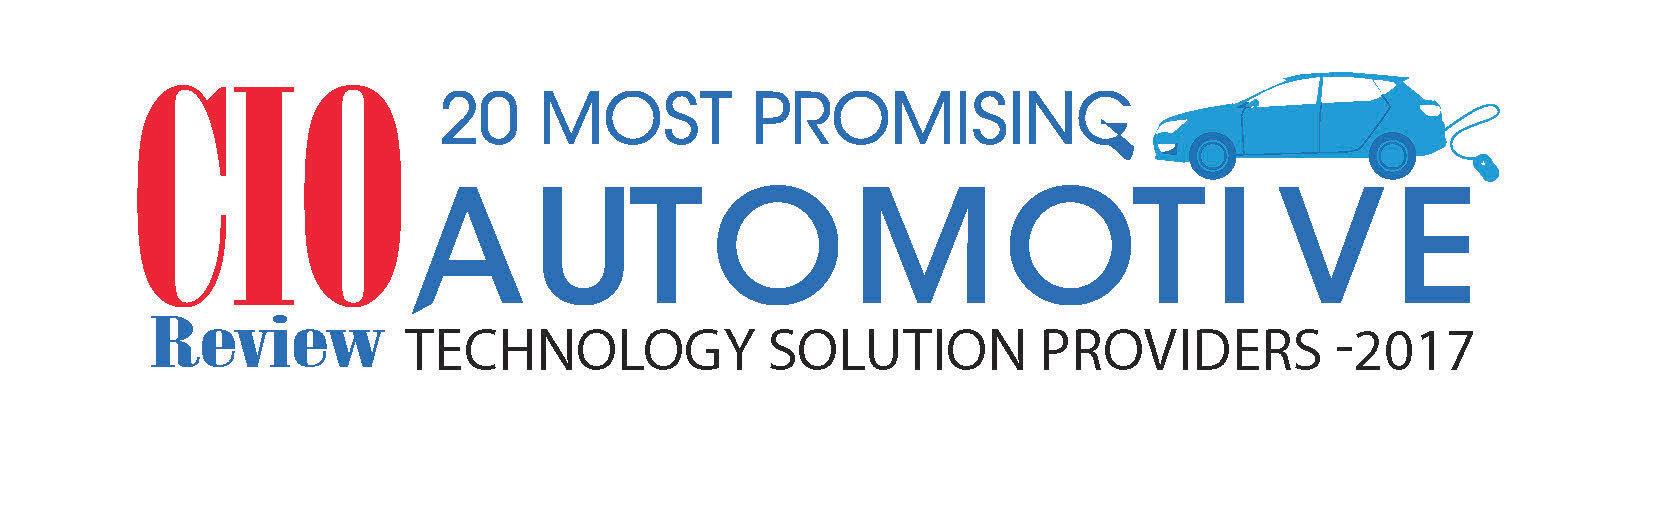 Cioreview Automotive Technology